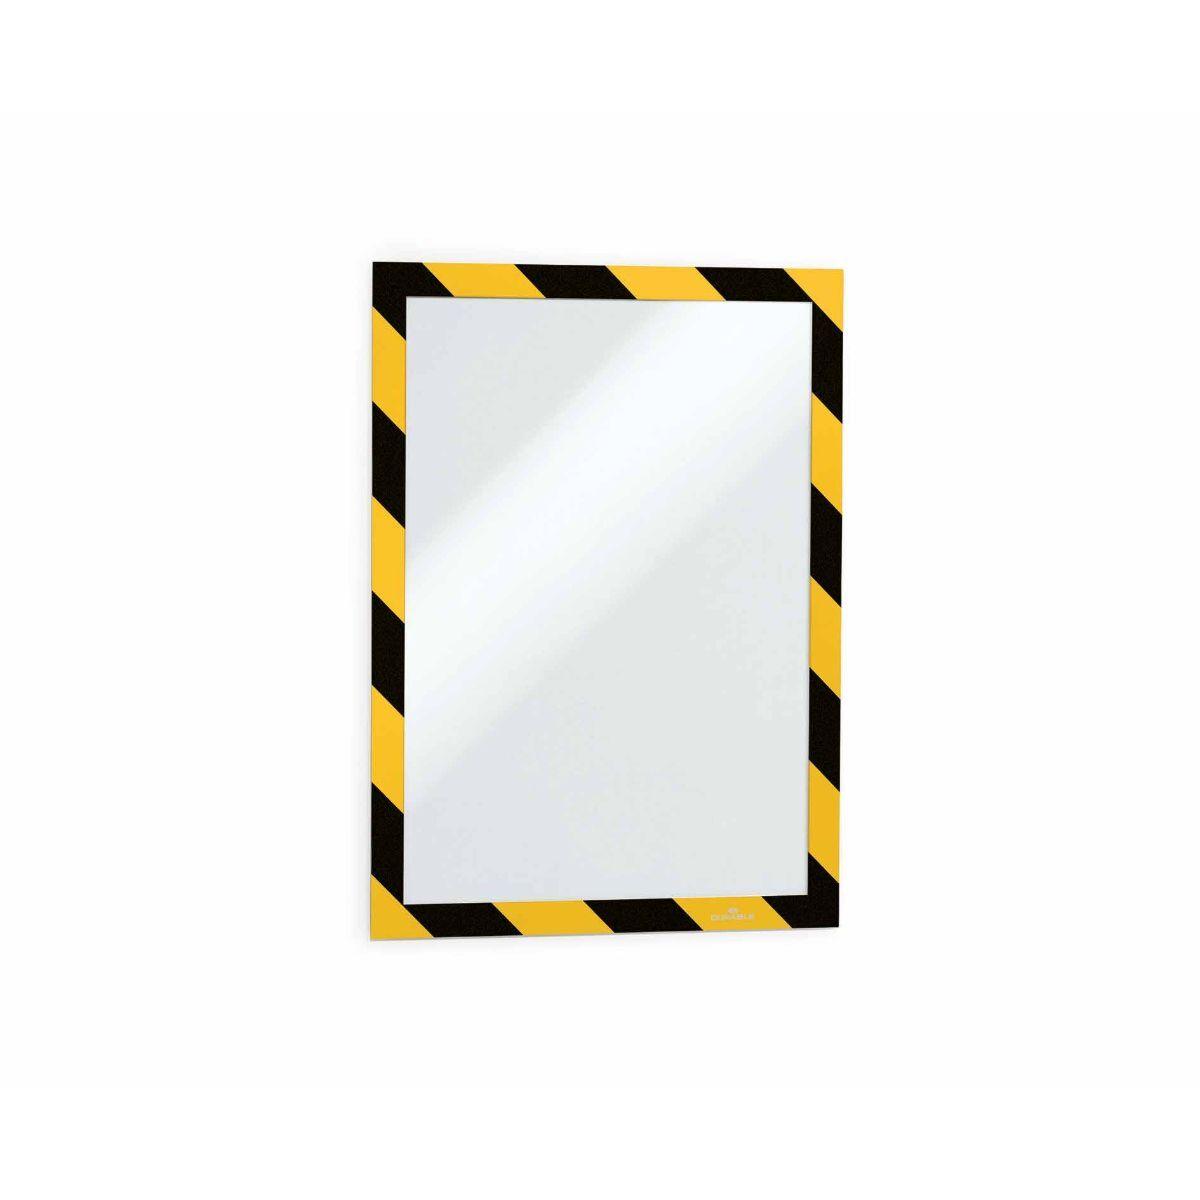 Duraframe Yellow and Black Warning Adhesive Frame A4